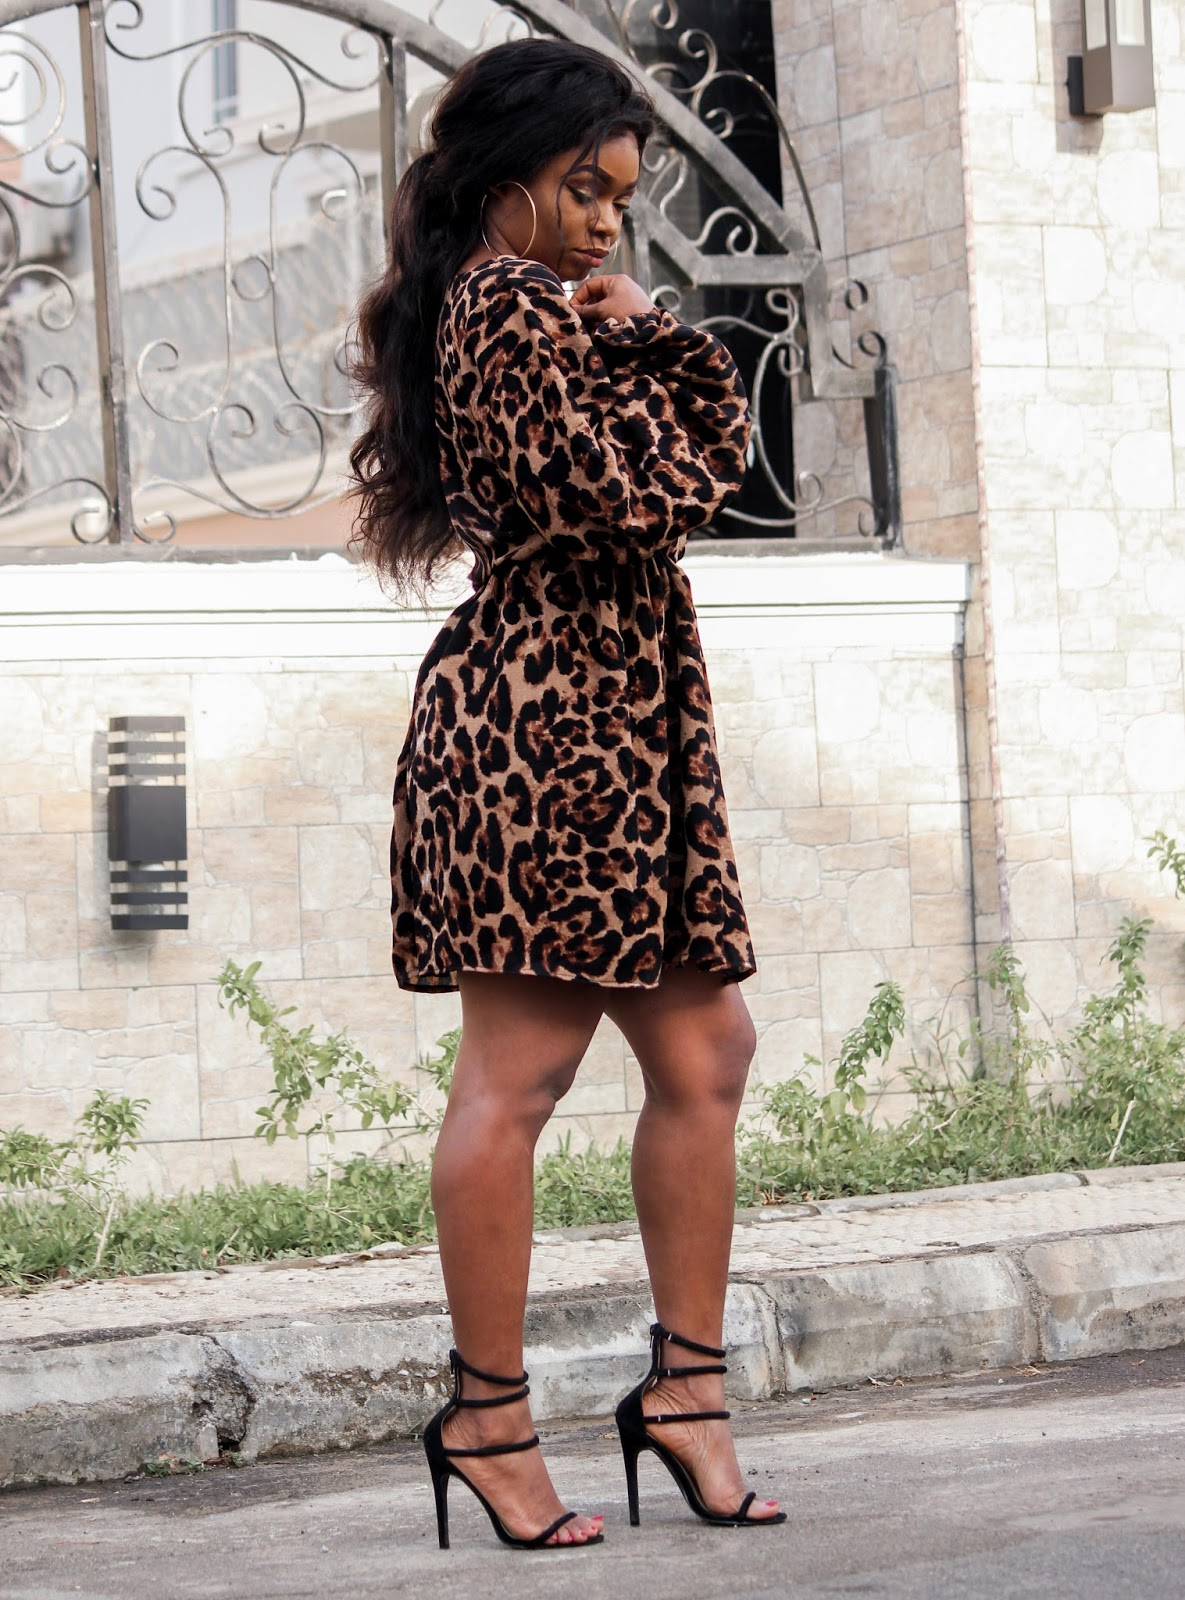 LEOPARD PRINT DRESS - Porshher Leopard Print Dress and black sandals from Public Desire